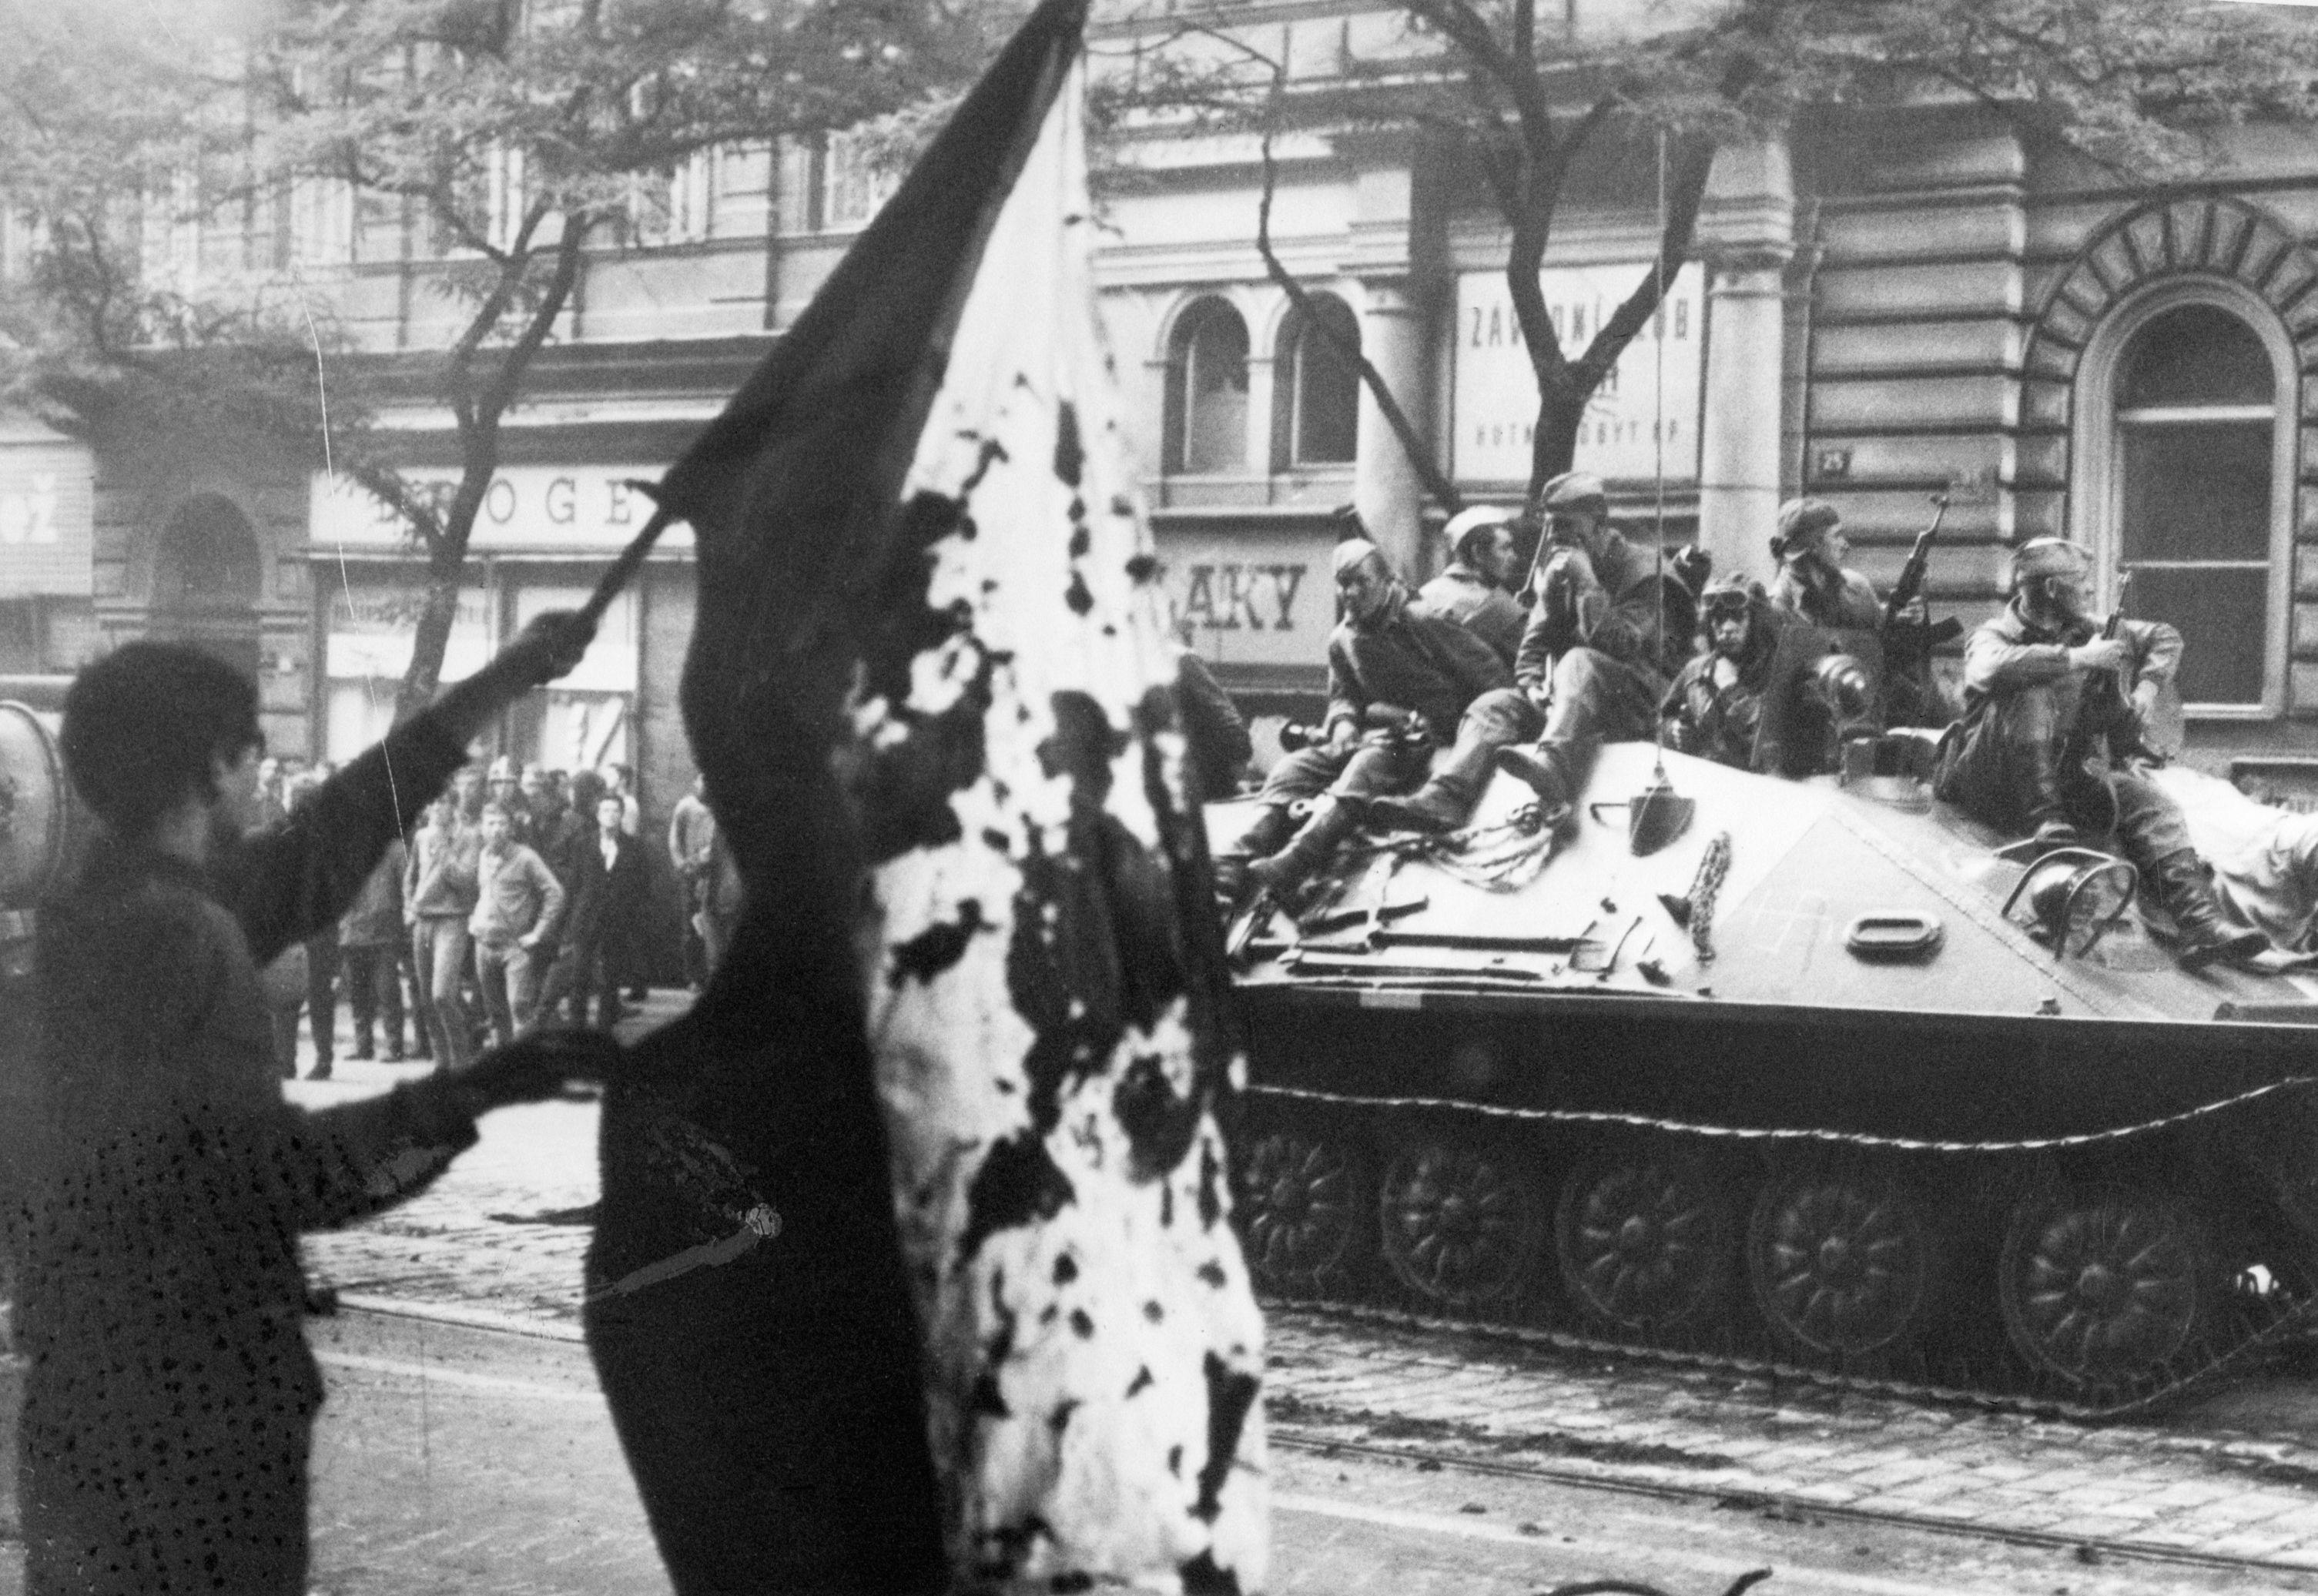 Photo of Soviet tanks invading Czechoslovakia in 1968